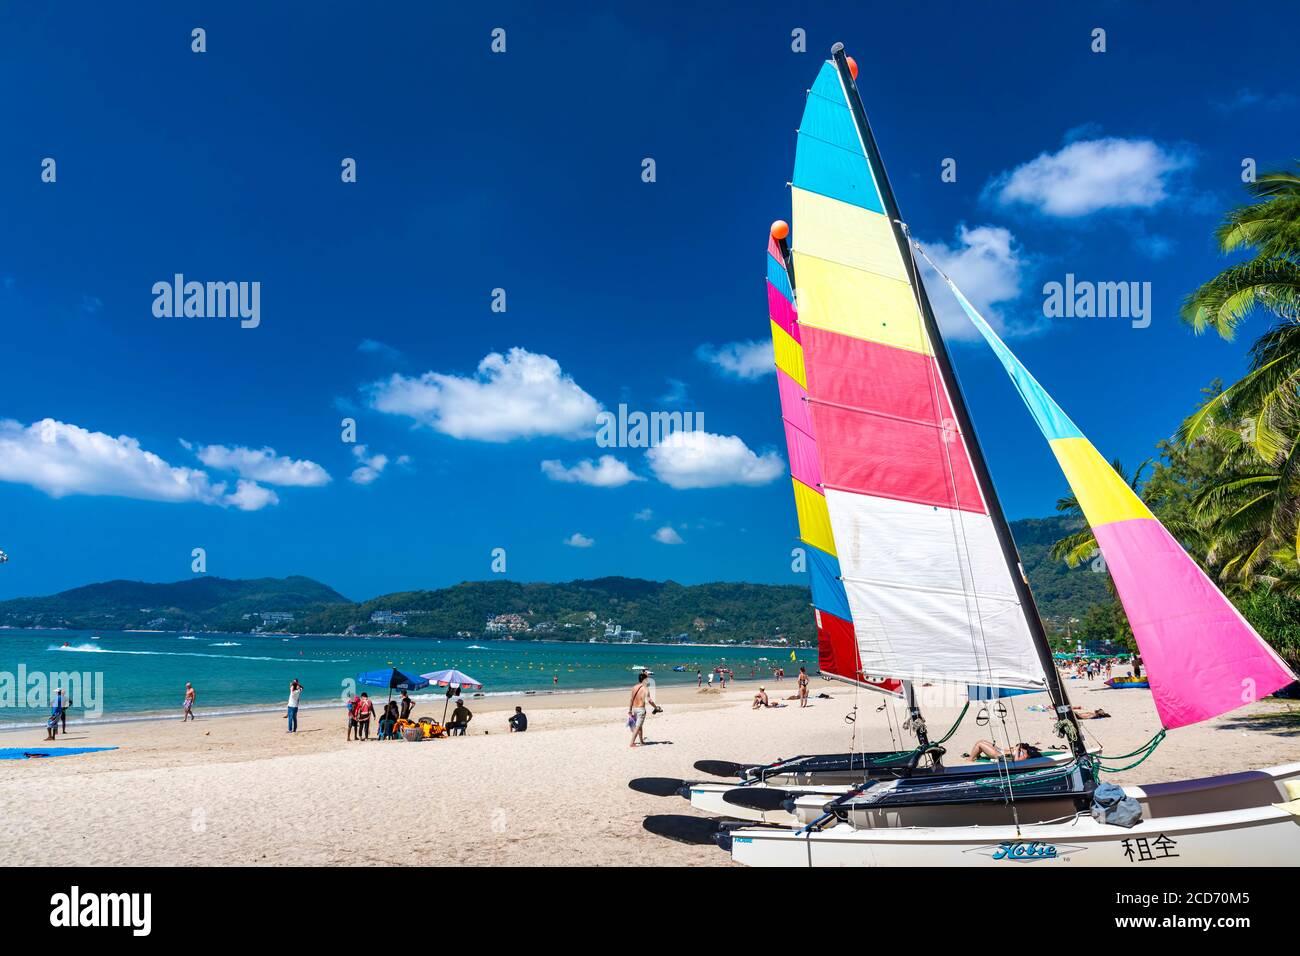 Alquiler de barcos en la playa en Patong, Phuket, Tailandia Foto de stock